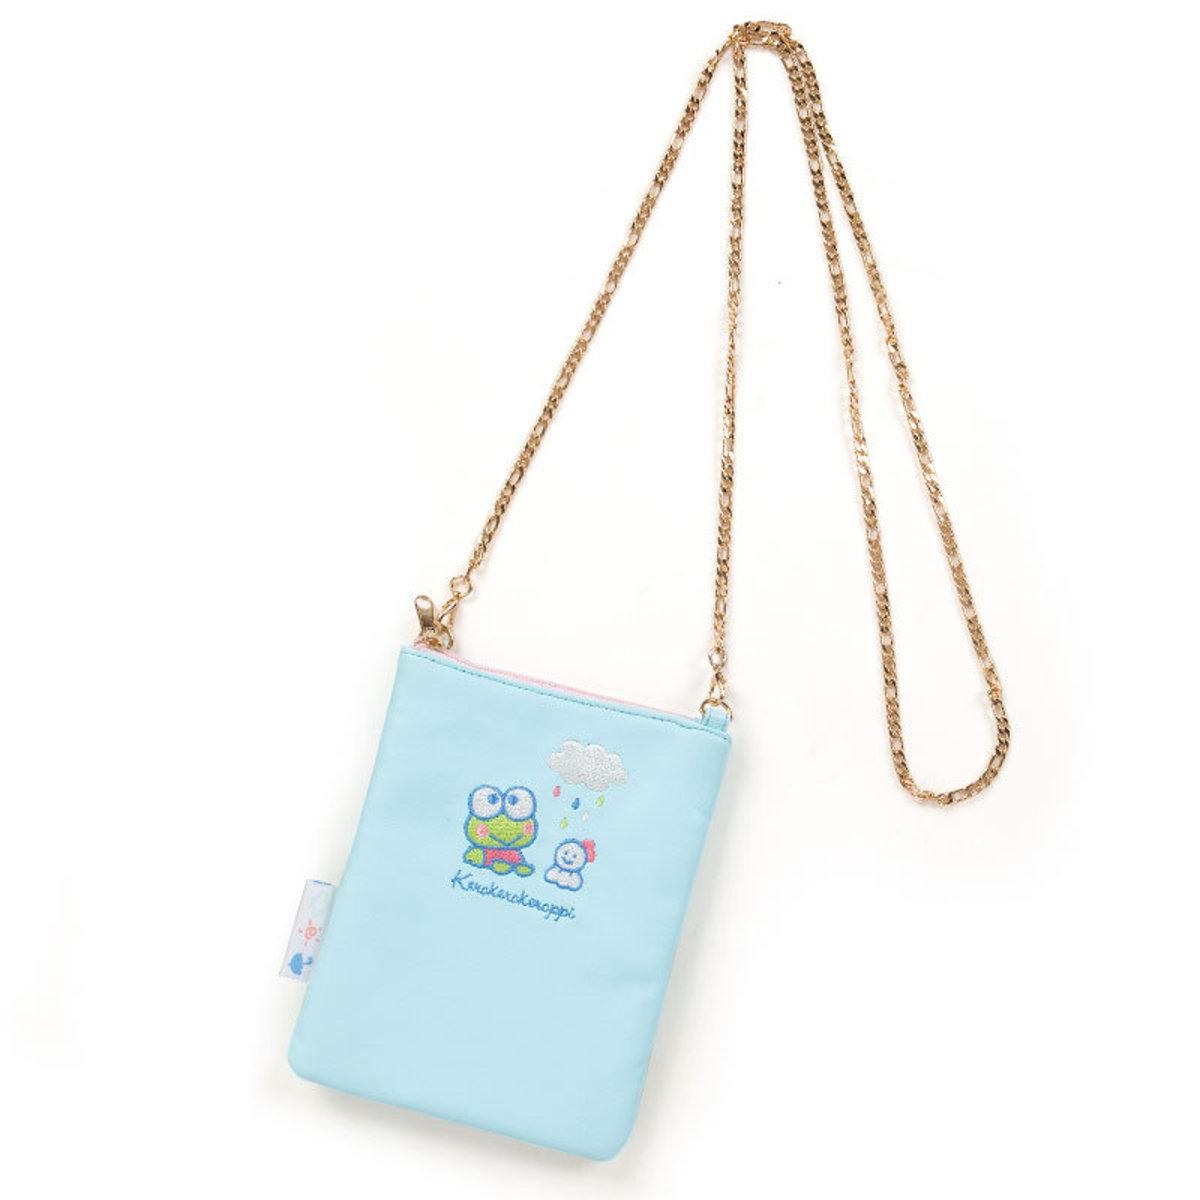 (Kerokeroppi) Japan Sanrio Shoulder Bag w/ Chain Strap